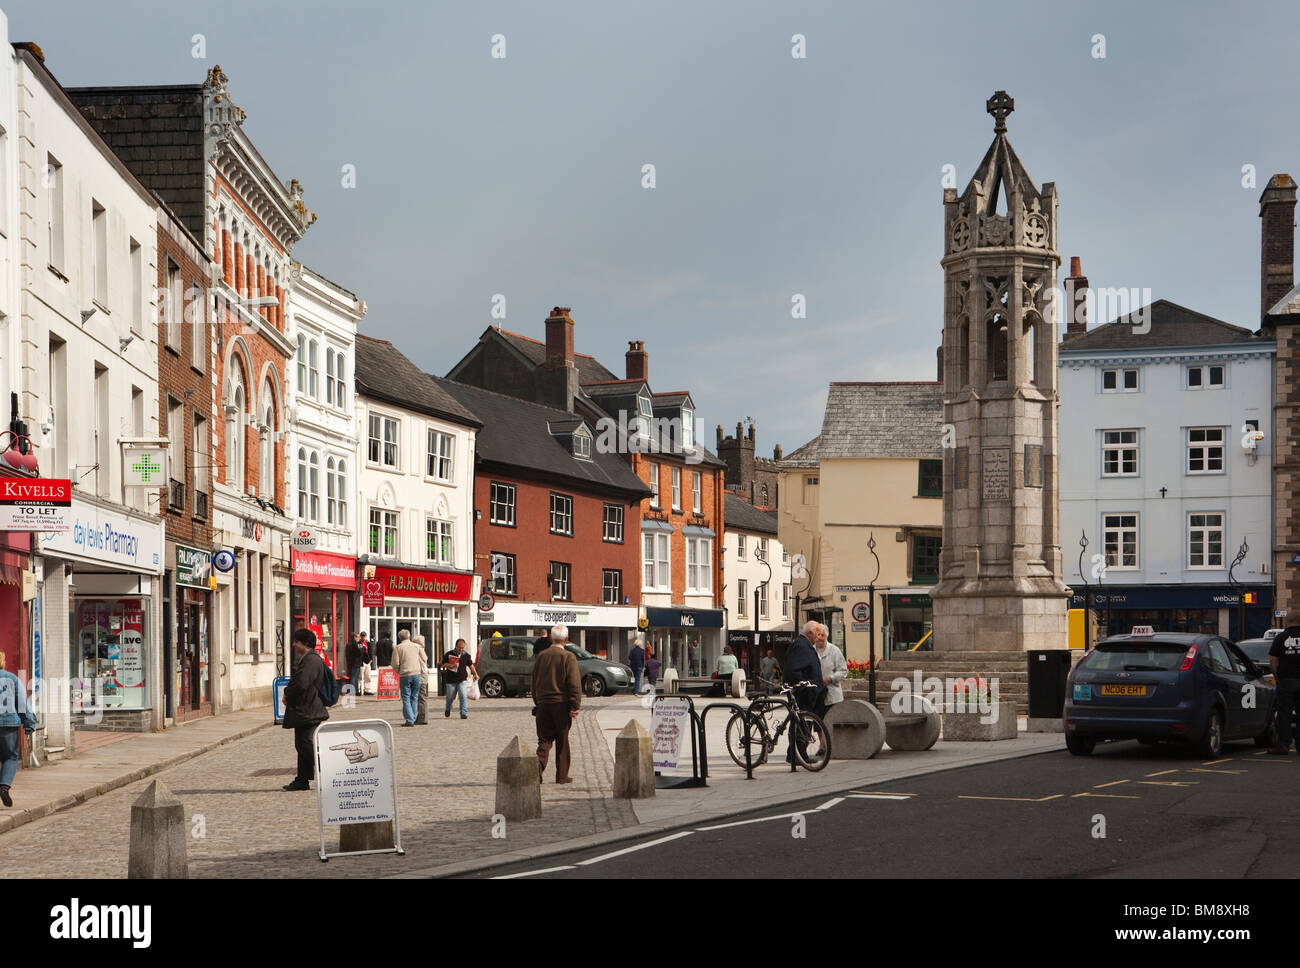 uk  cornwall  launceston  market square  shops opposite war memorial stock photo  royalty free